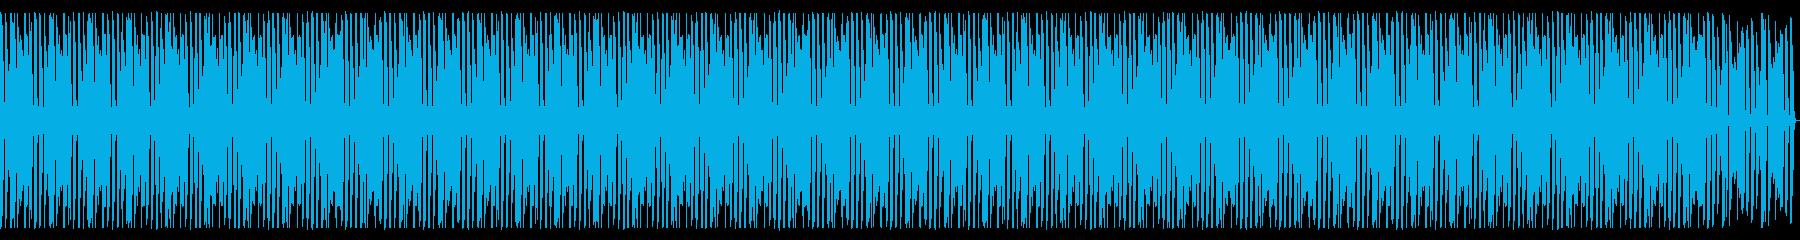 SELECT エレクトリックピアノ 愉快の再生済みの波形